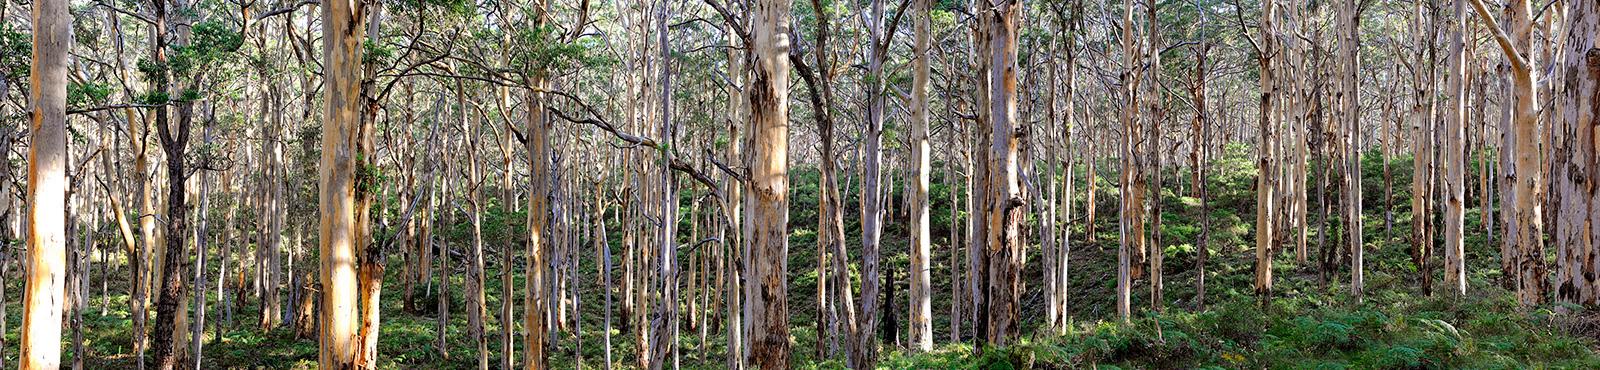 Jason Mazur - 'Boranup Forest, Margaret River W.A. 034'